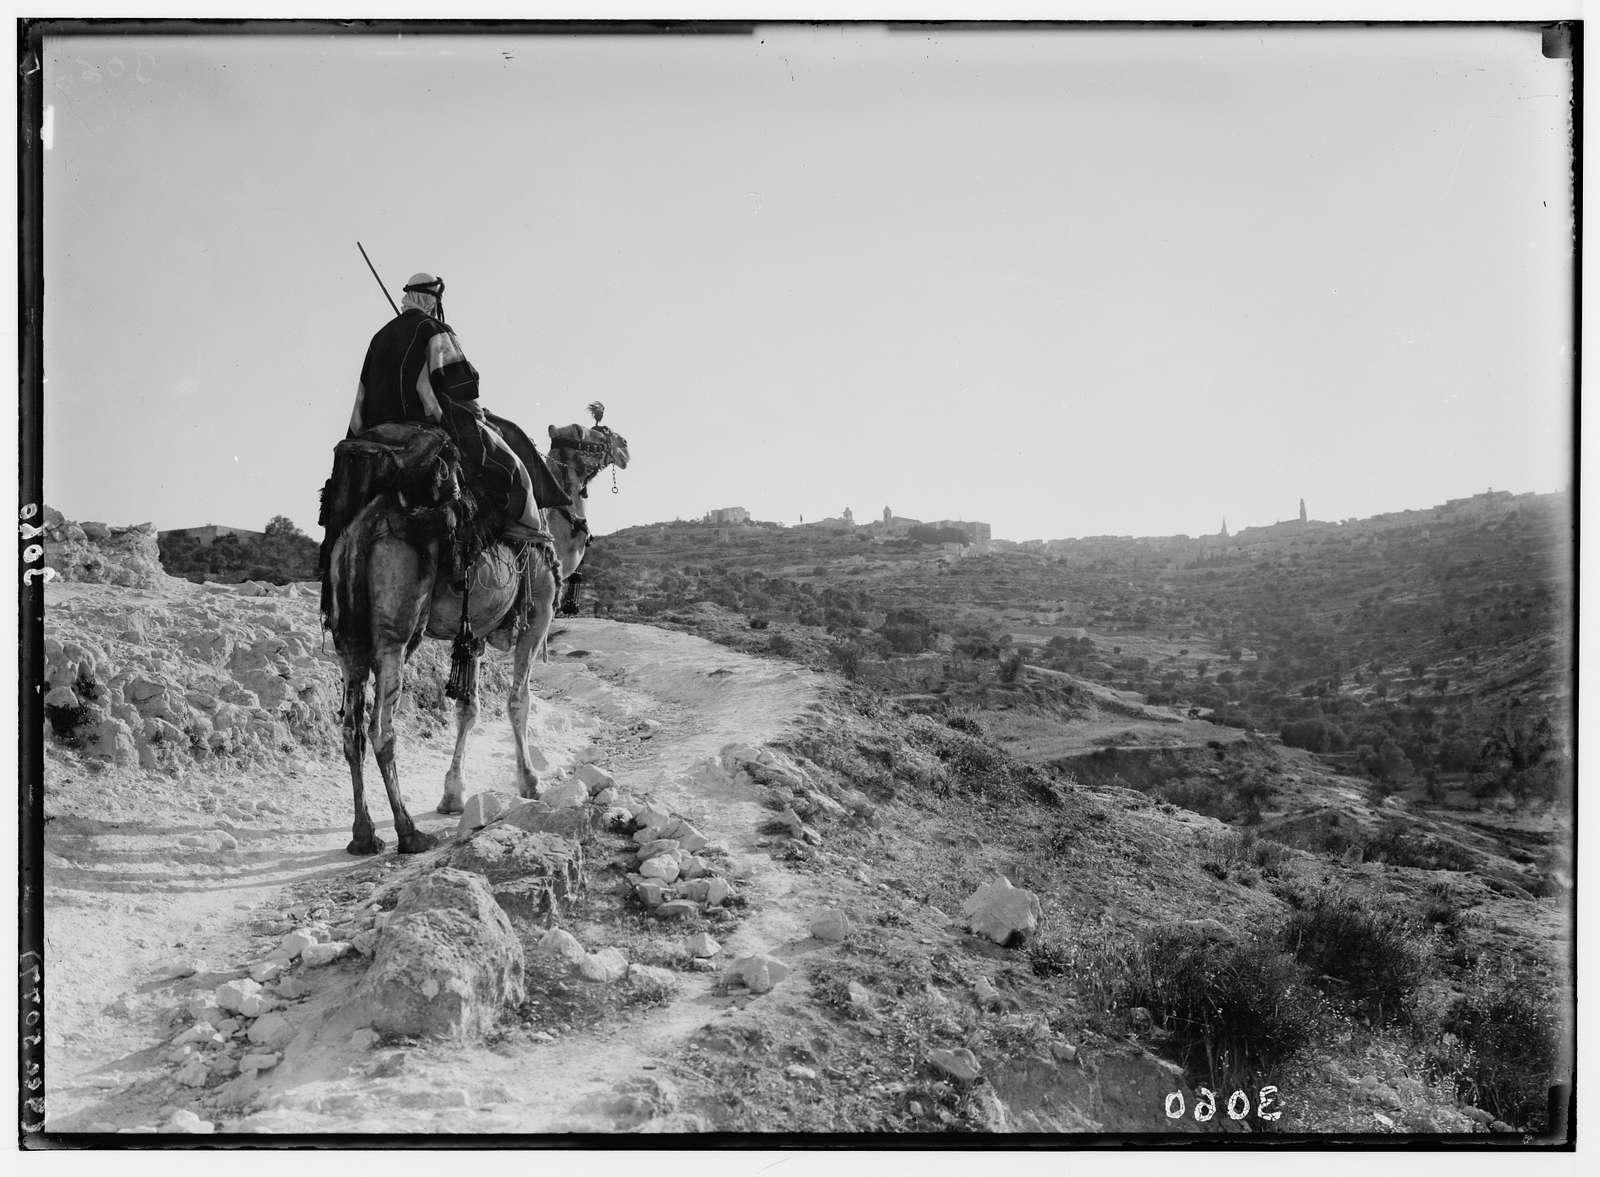 Bethlehem and surroundings. Evening on road to Bethlehem. Camel-rider approaching Bethlehem in the twilight